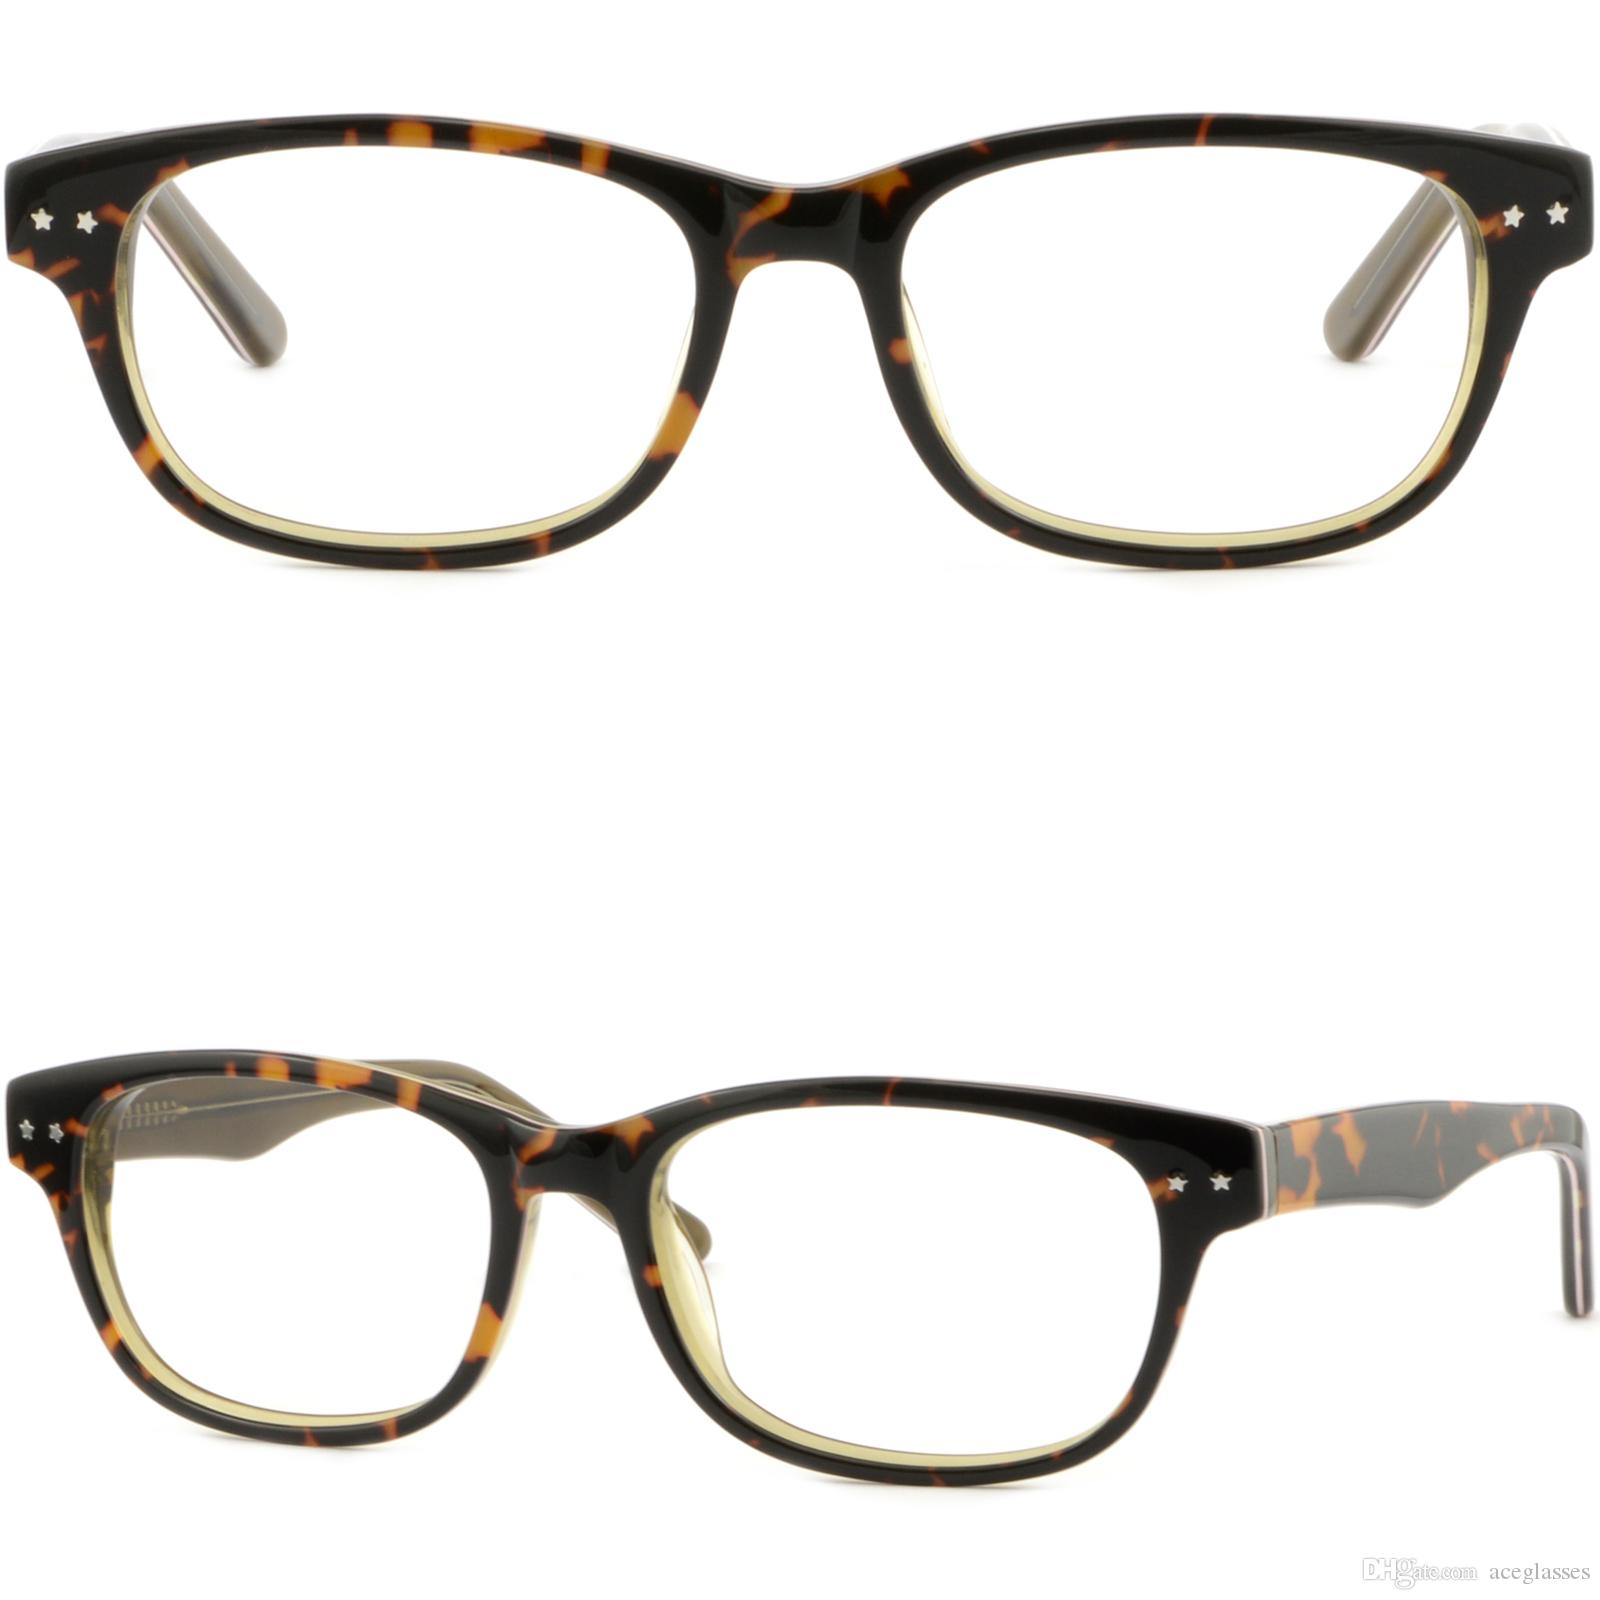 4cfe5aedd8 Rectangle Women s Frame Plastic Prescription Glasses Sunglasses ...